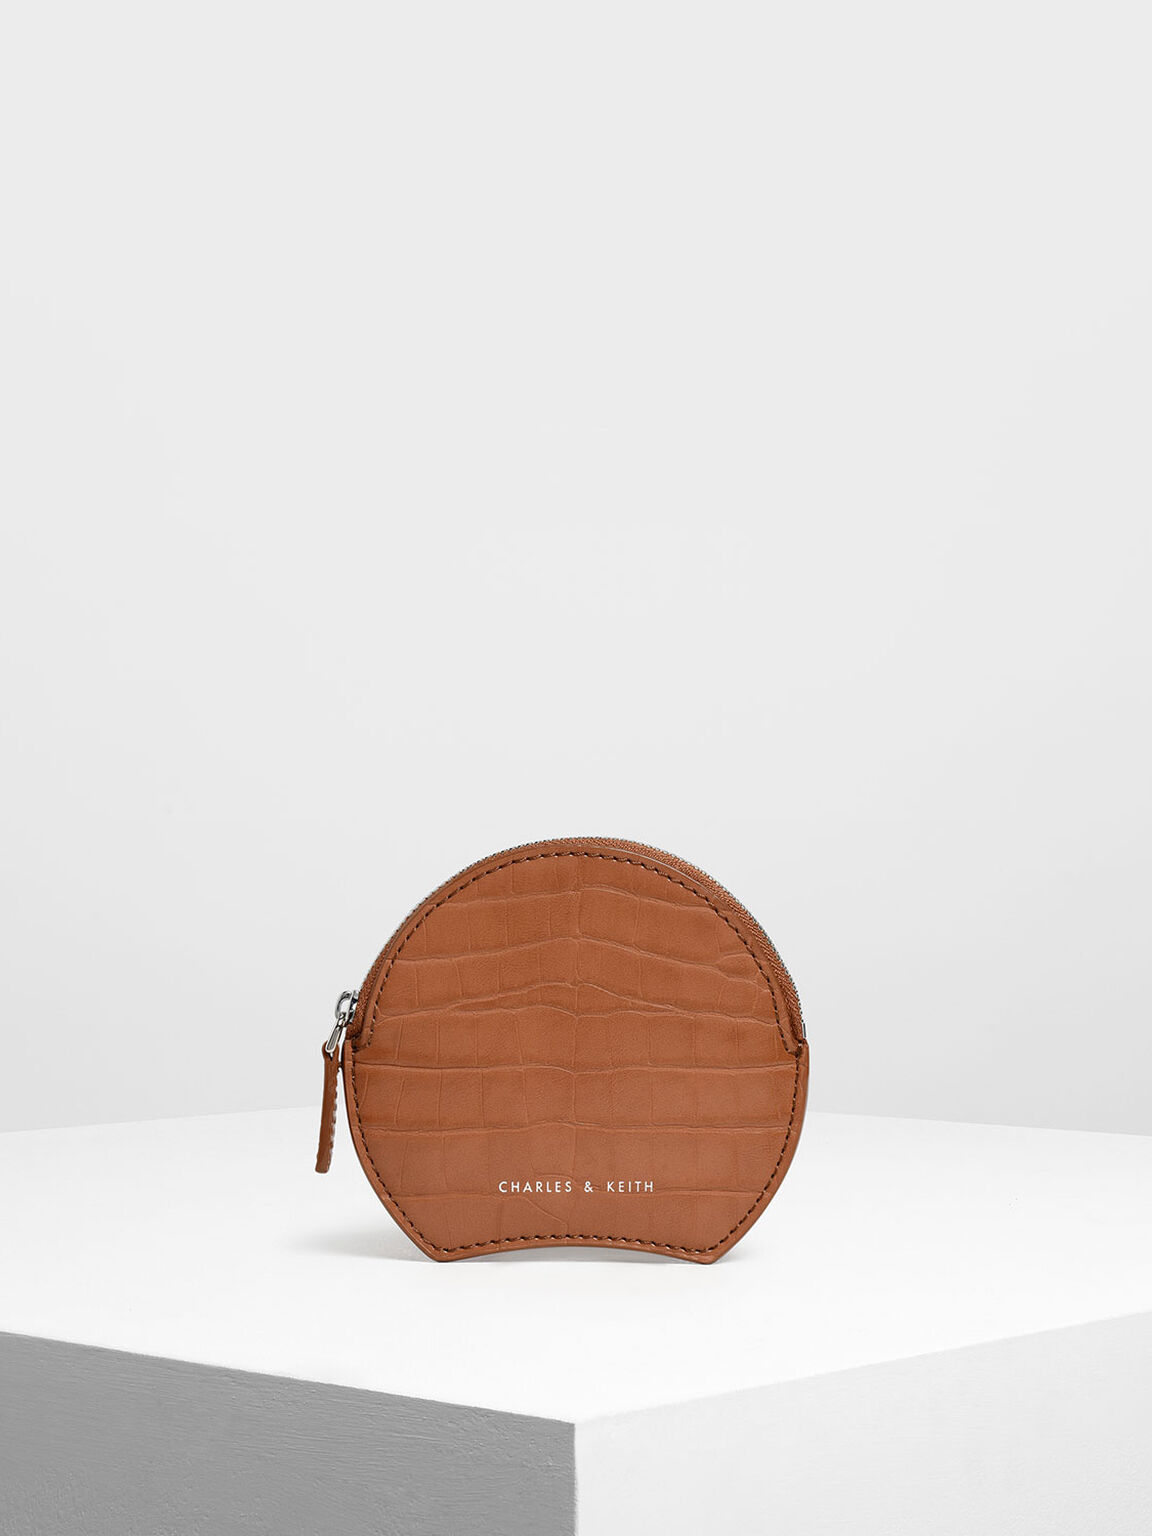 Semi Circle Croc-Effect Mini Pouch, Tan, hi-res